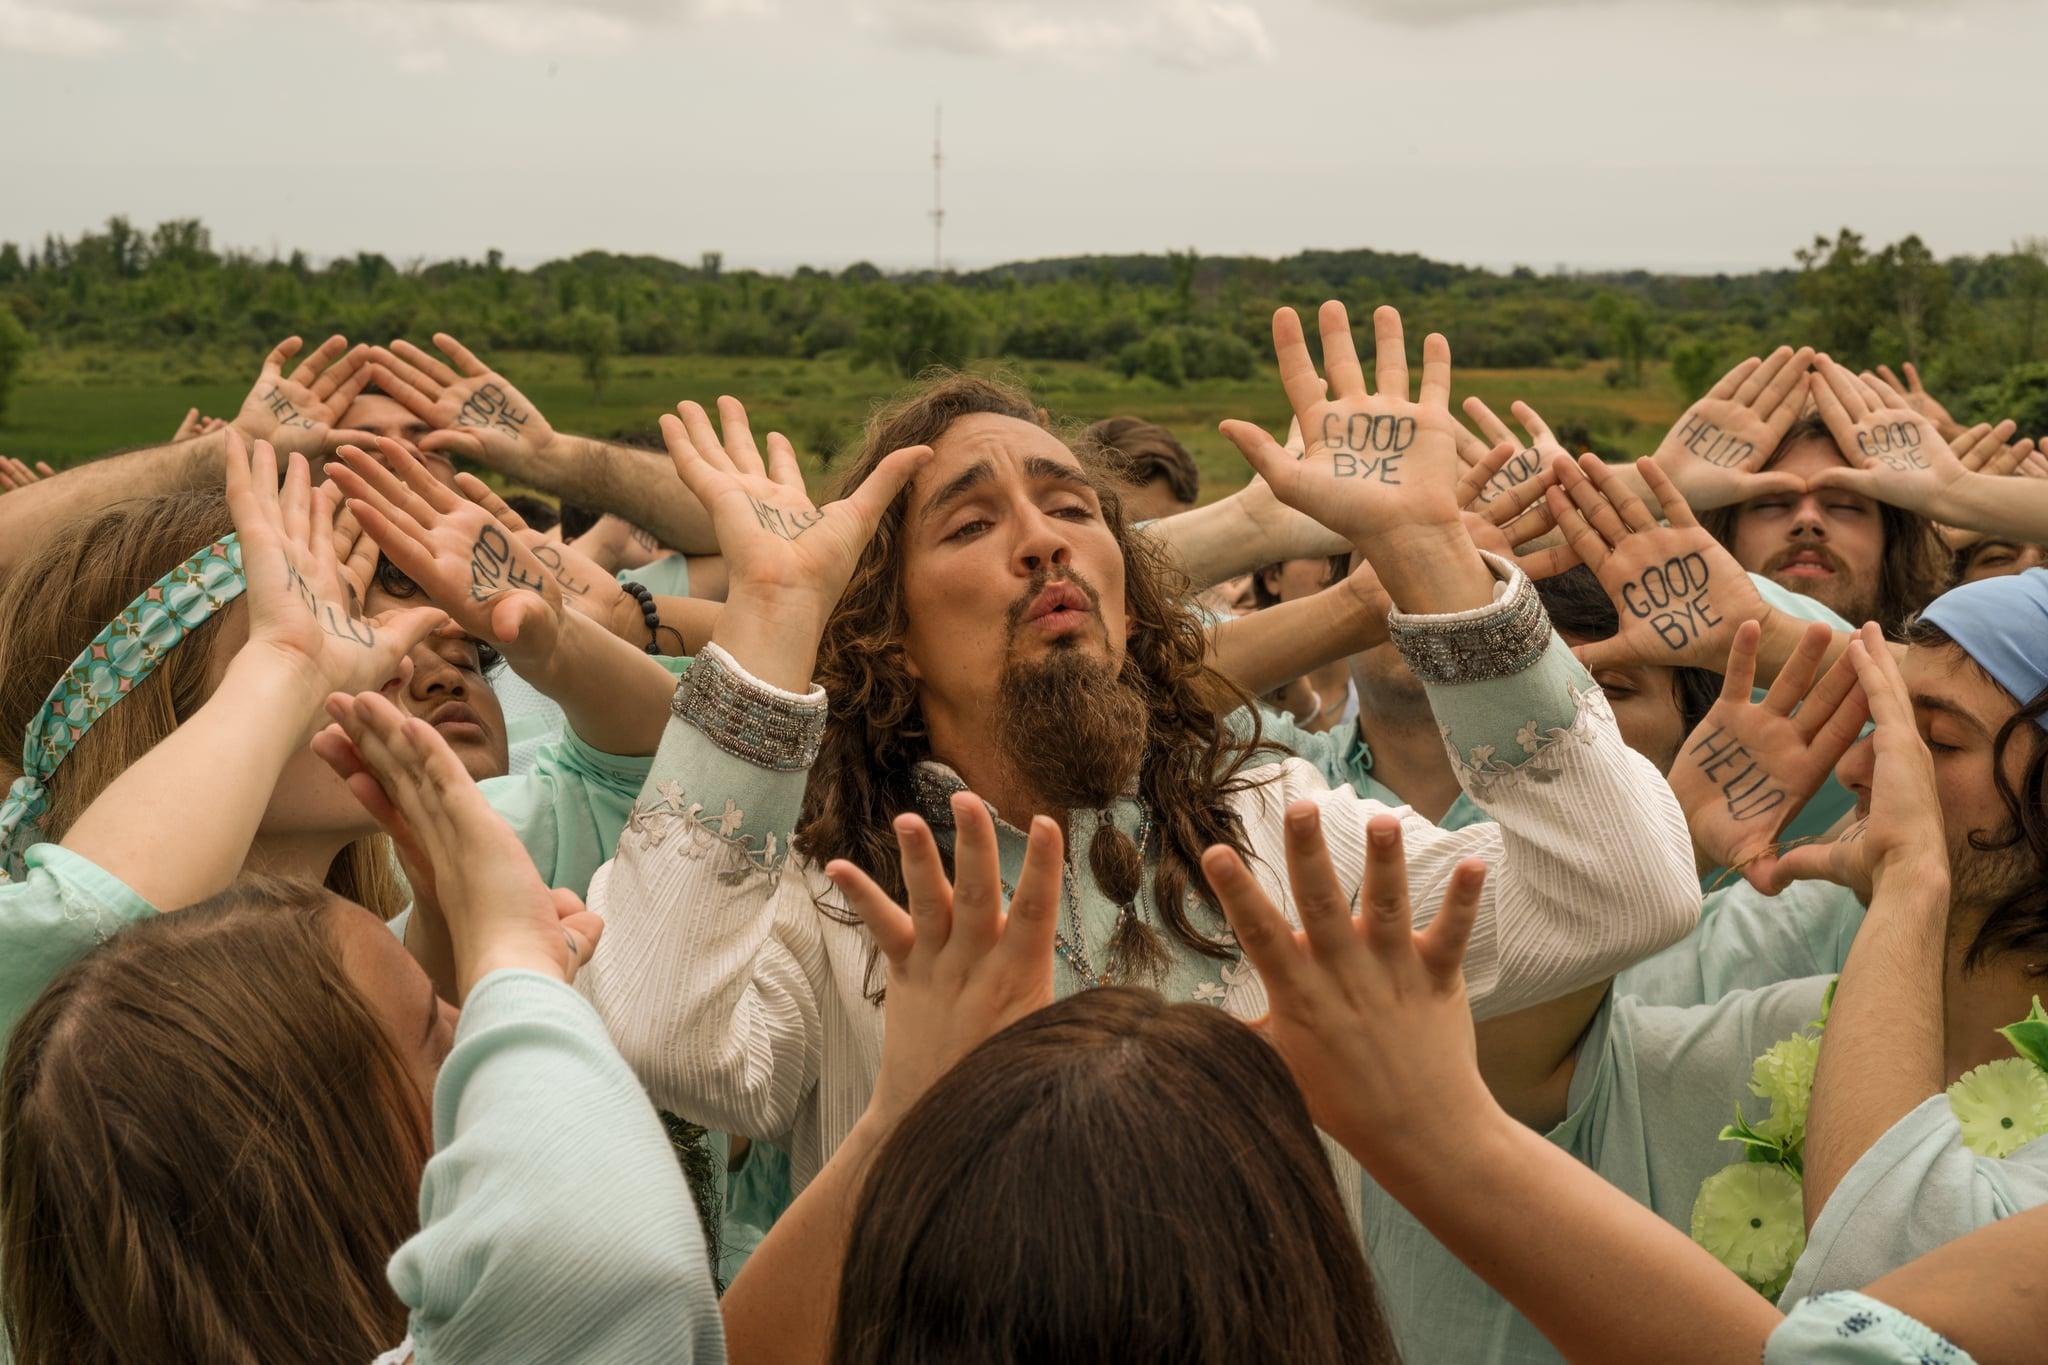 THE UMBRELLA ACADEMY ROBERT SHEEHAN as KLAUS HARGREEVES in episode 203 of THE UMBRELLA ACADEMY Cr. CHRISTOS KALOHORIDIS/NETFLIX  2020